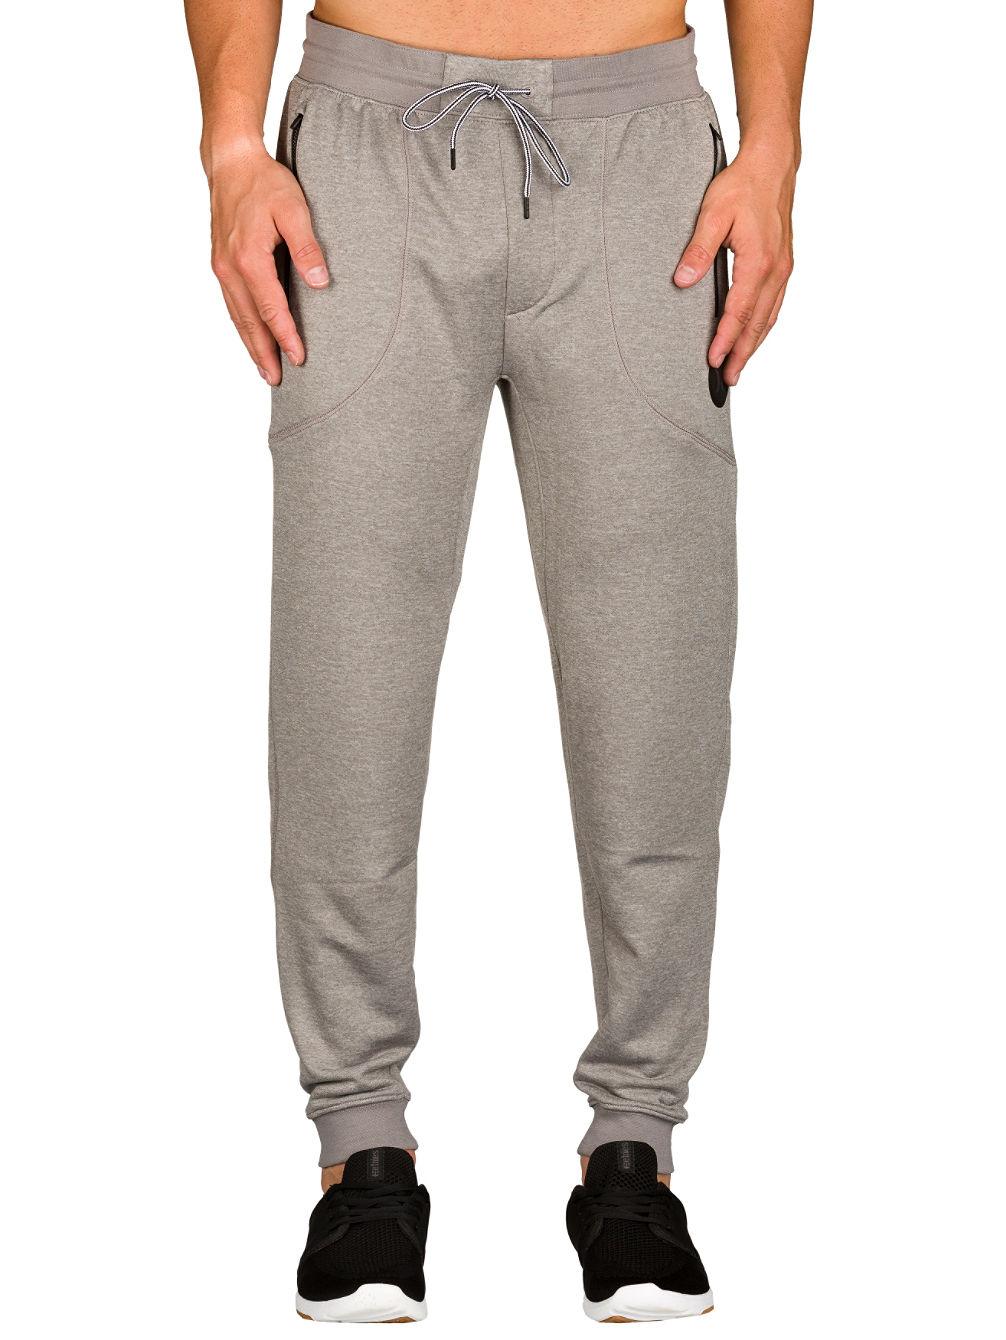 hurley-dri-fit-disperse-jogging-pants